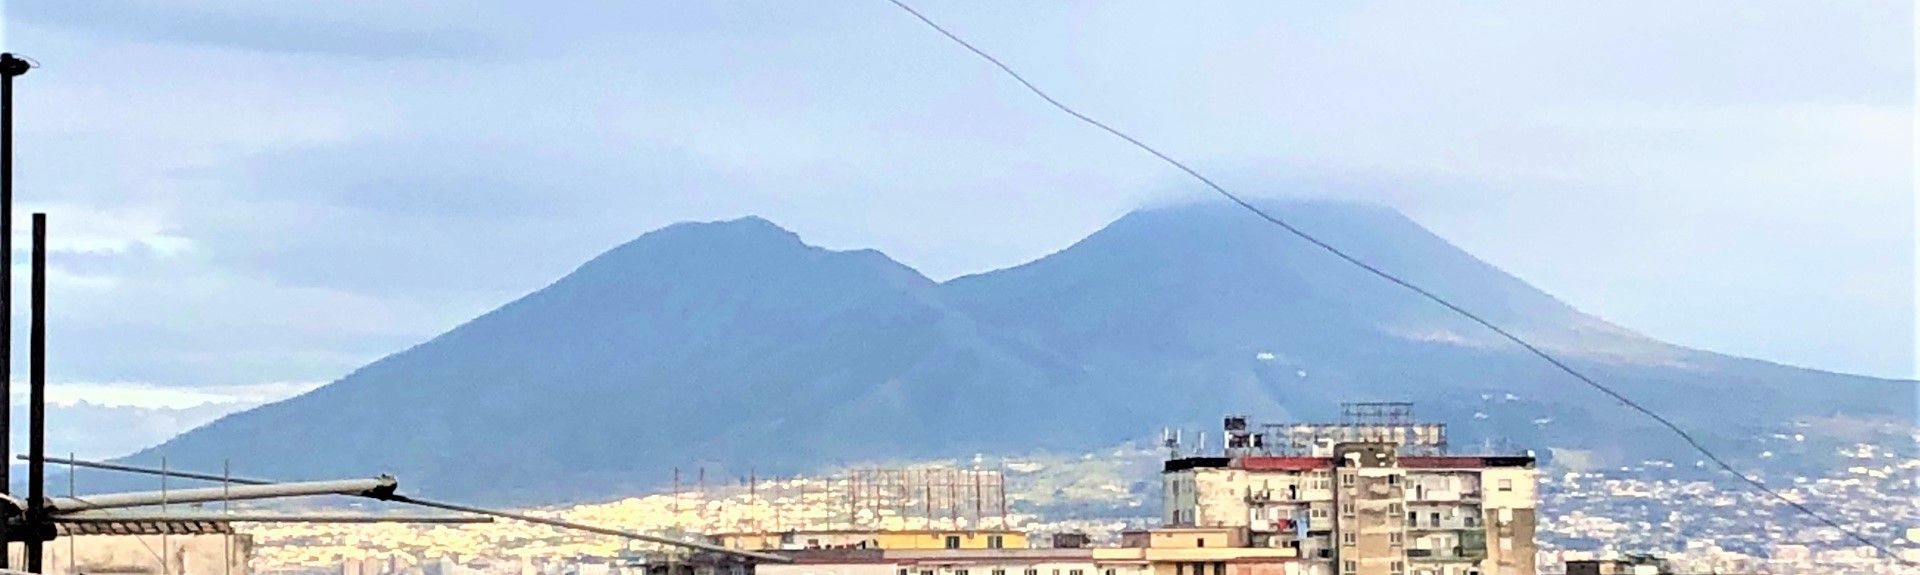 Decumani, Naples, Campania, Italy